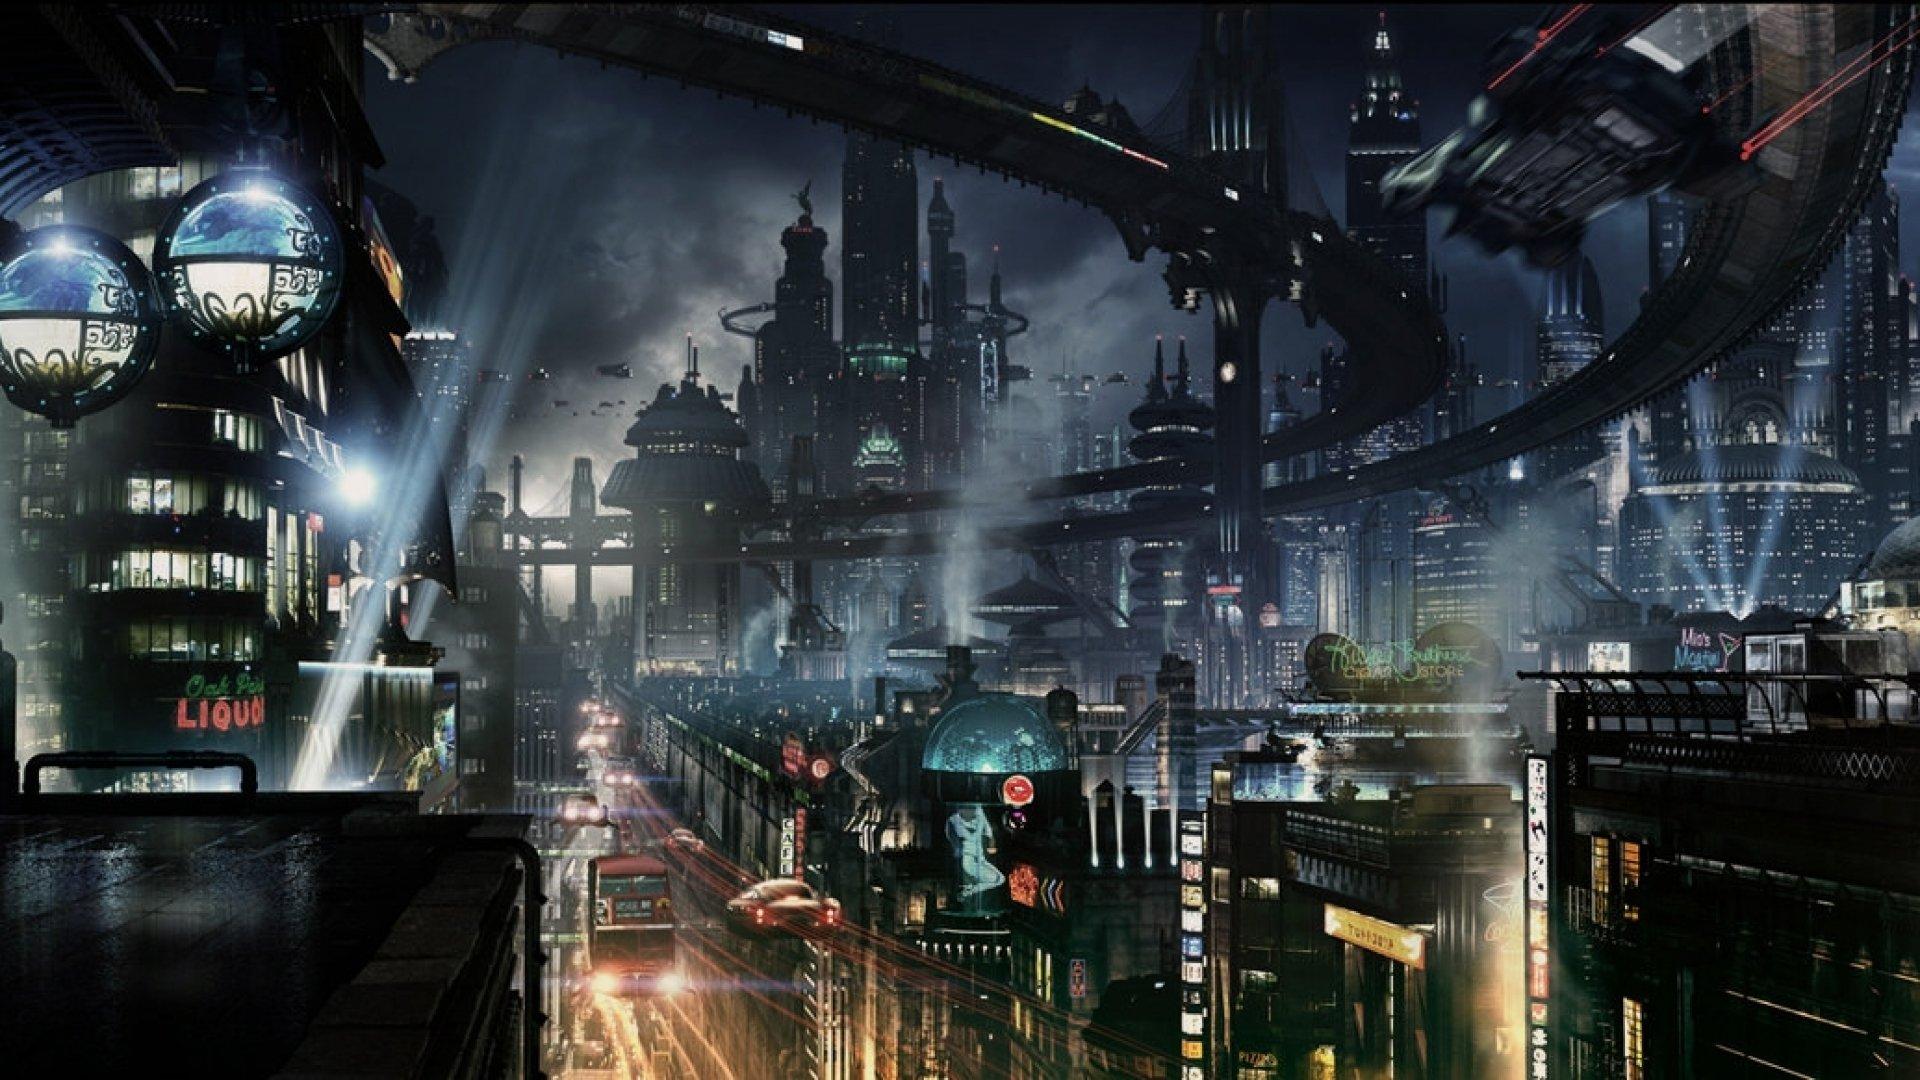 Futurist Anime Girl Wallpaper Sci Fi Futuristic City Cities Art Artwork Wallpaper